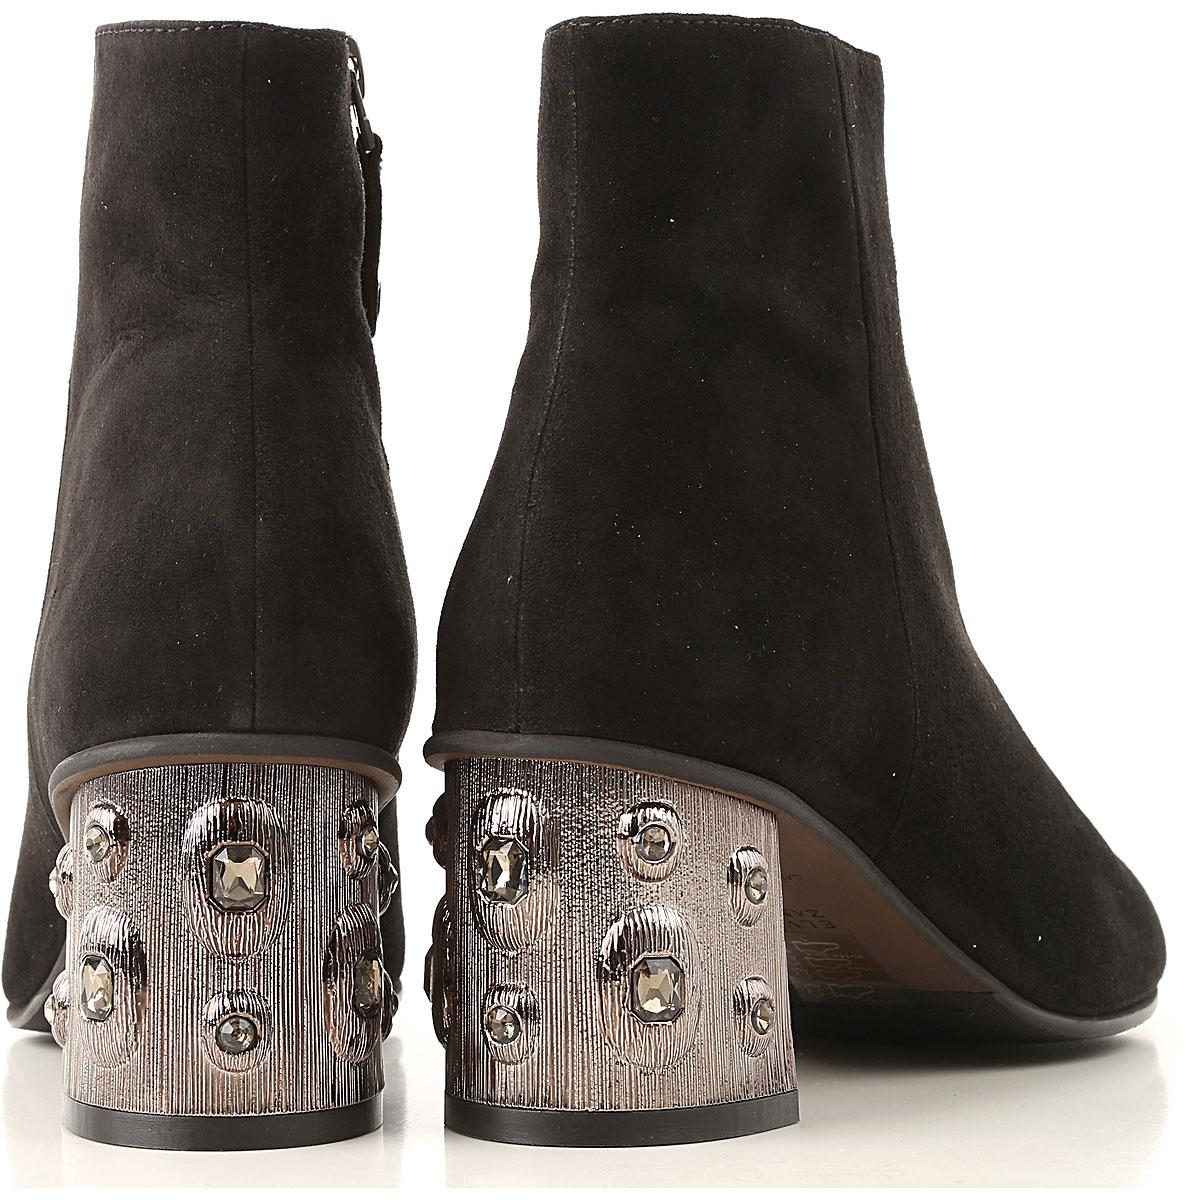 2018 Zapatos 19 Otoño Zanon nbsp; Mujer Elvio Negro Para invierno p7aqwYA